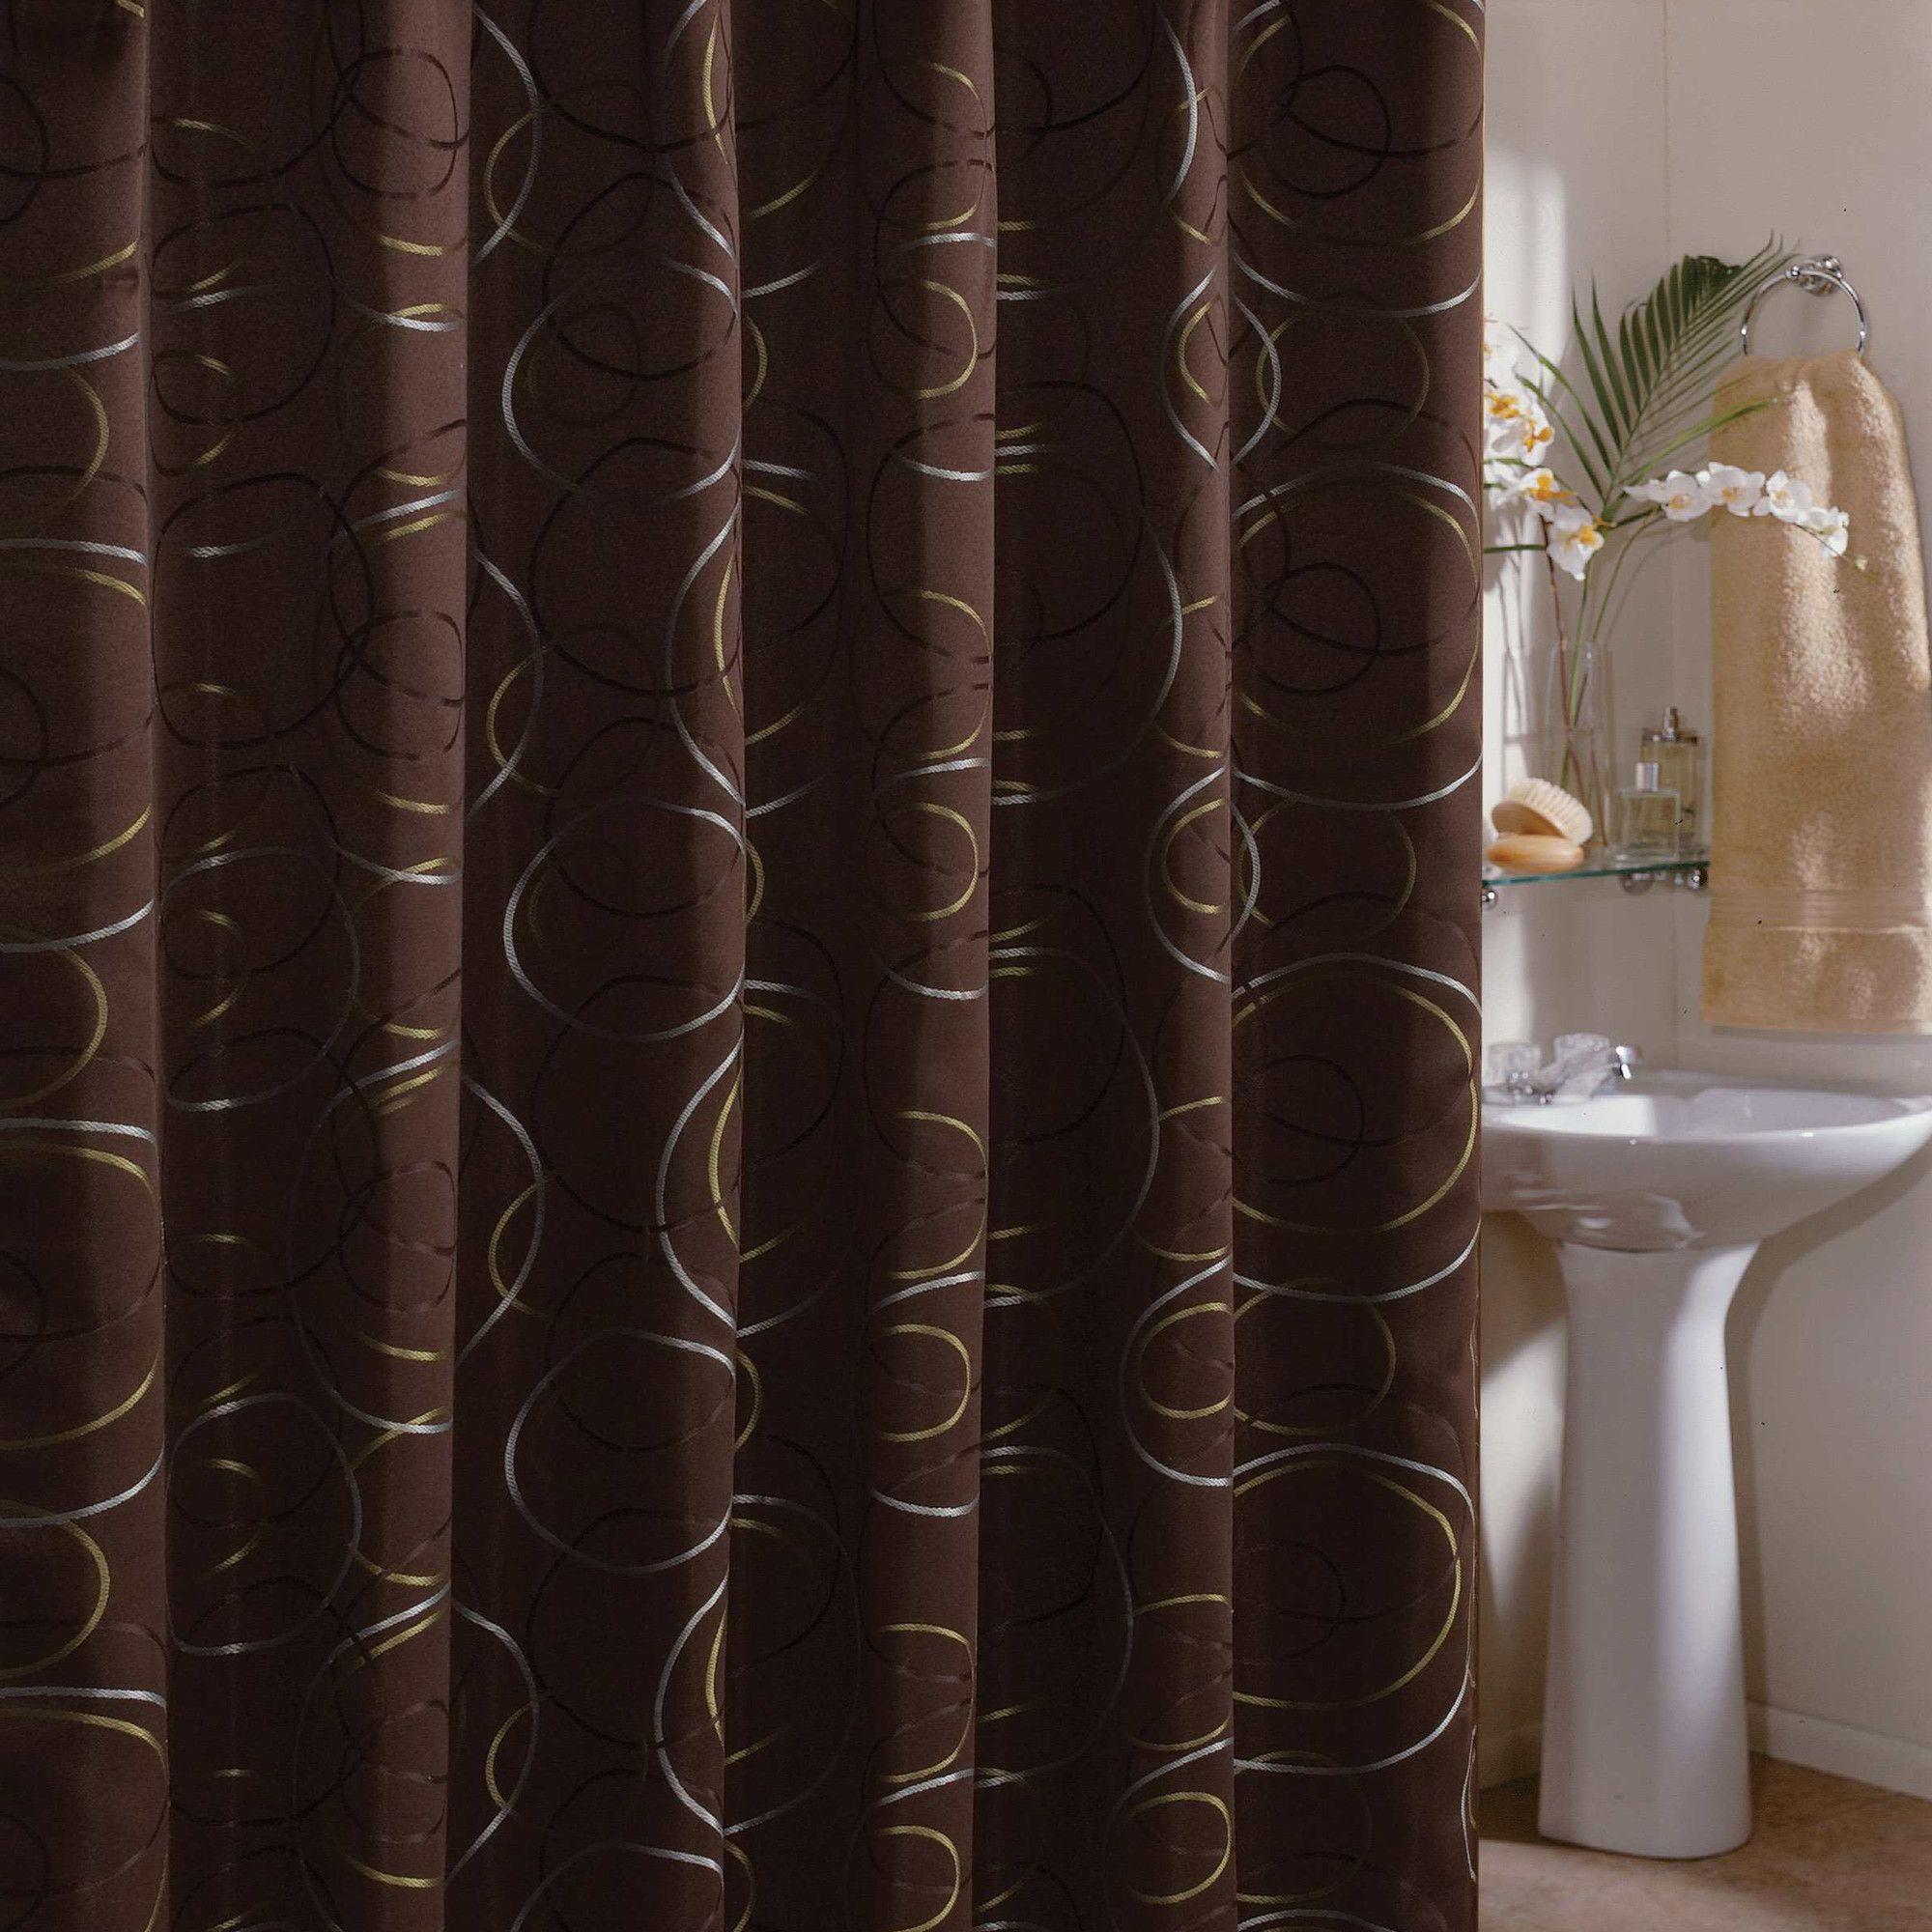 Veratex Eclipse Shower Curtain In Chocolate Wayfair Brown